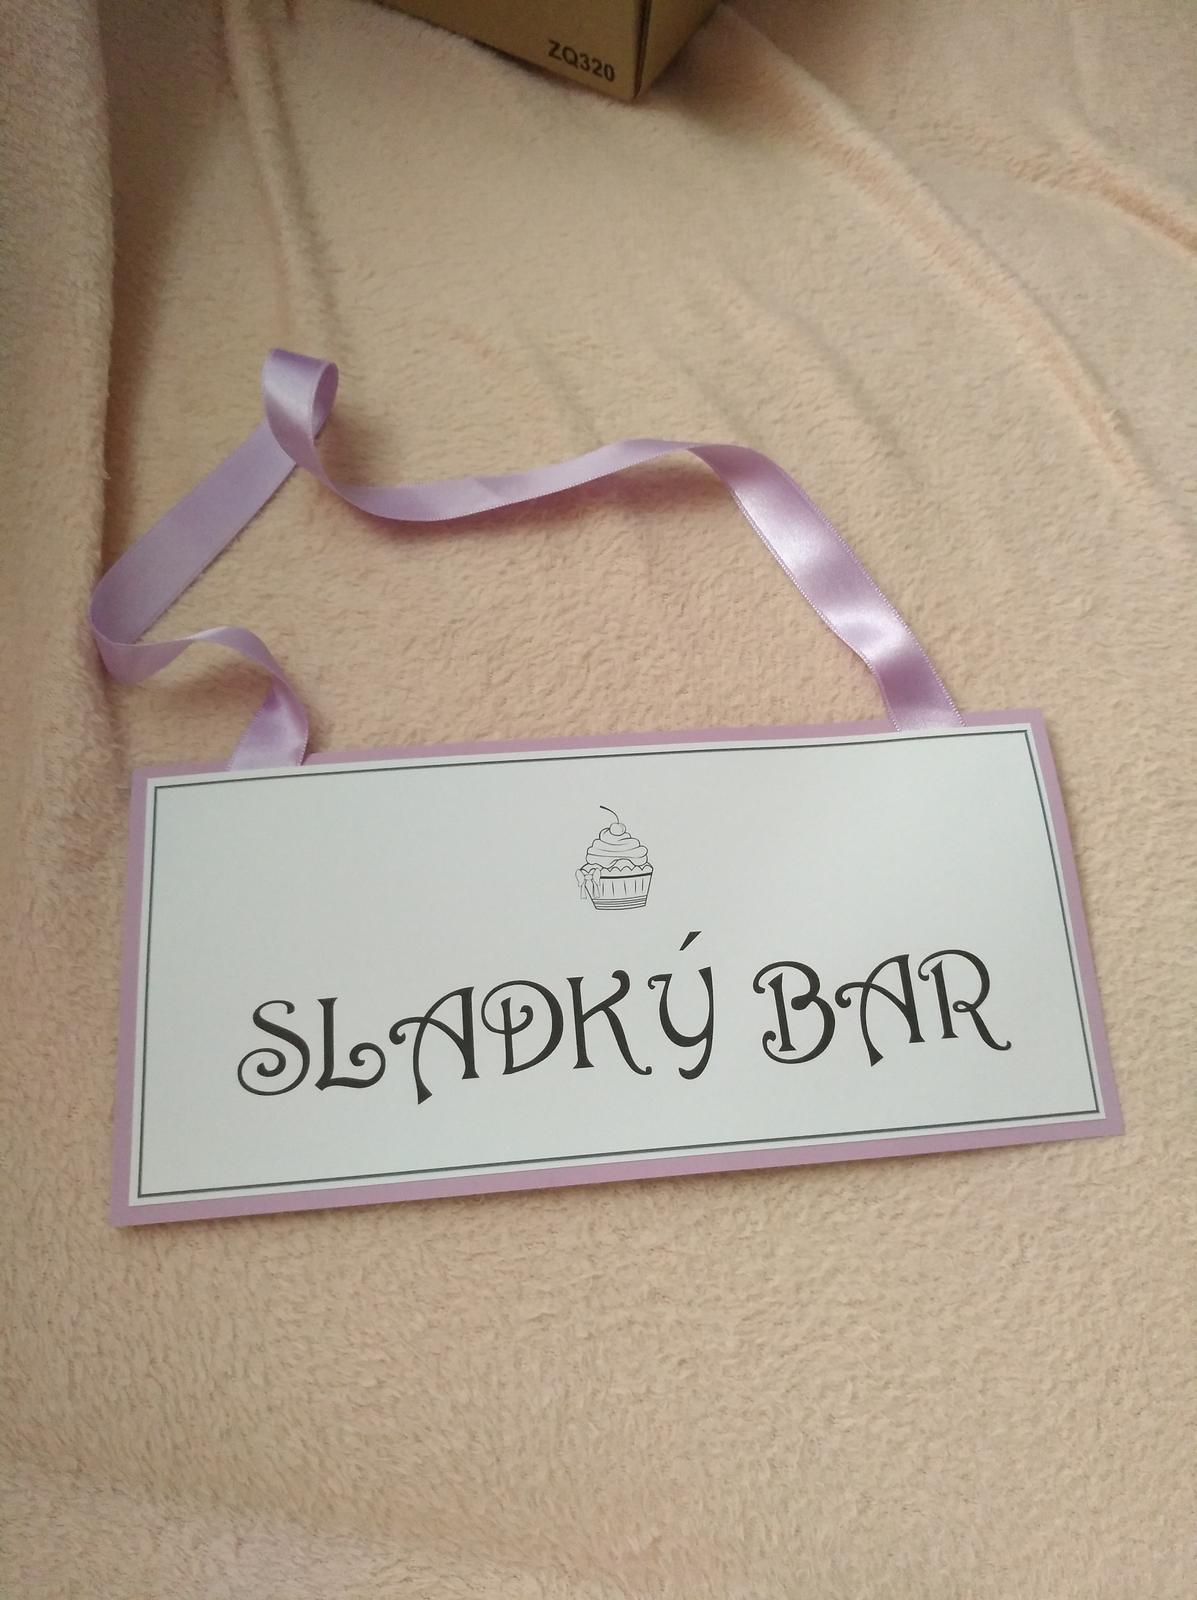 Cedule sladký bar - Obrázek č. 1